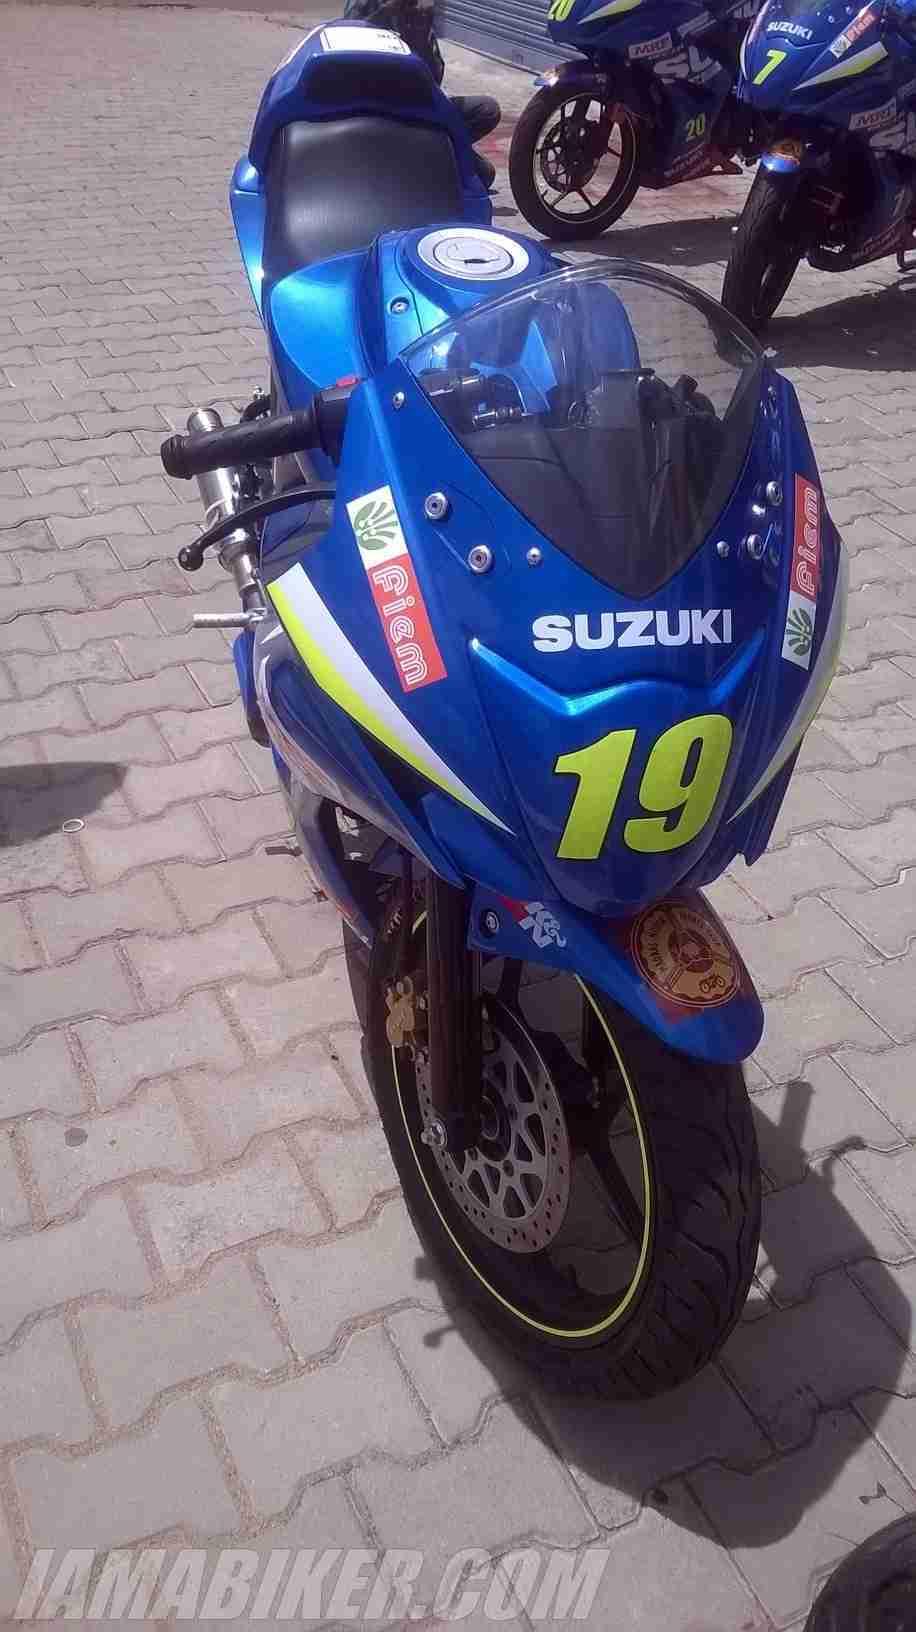 Suzuki Gixxer SF race spec Gixxer Cup bike